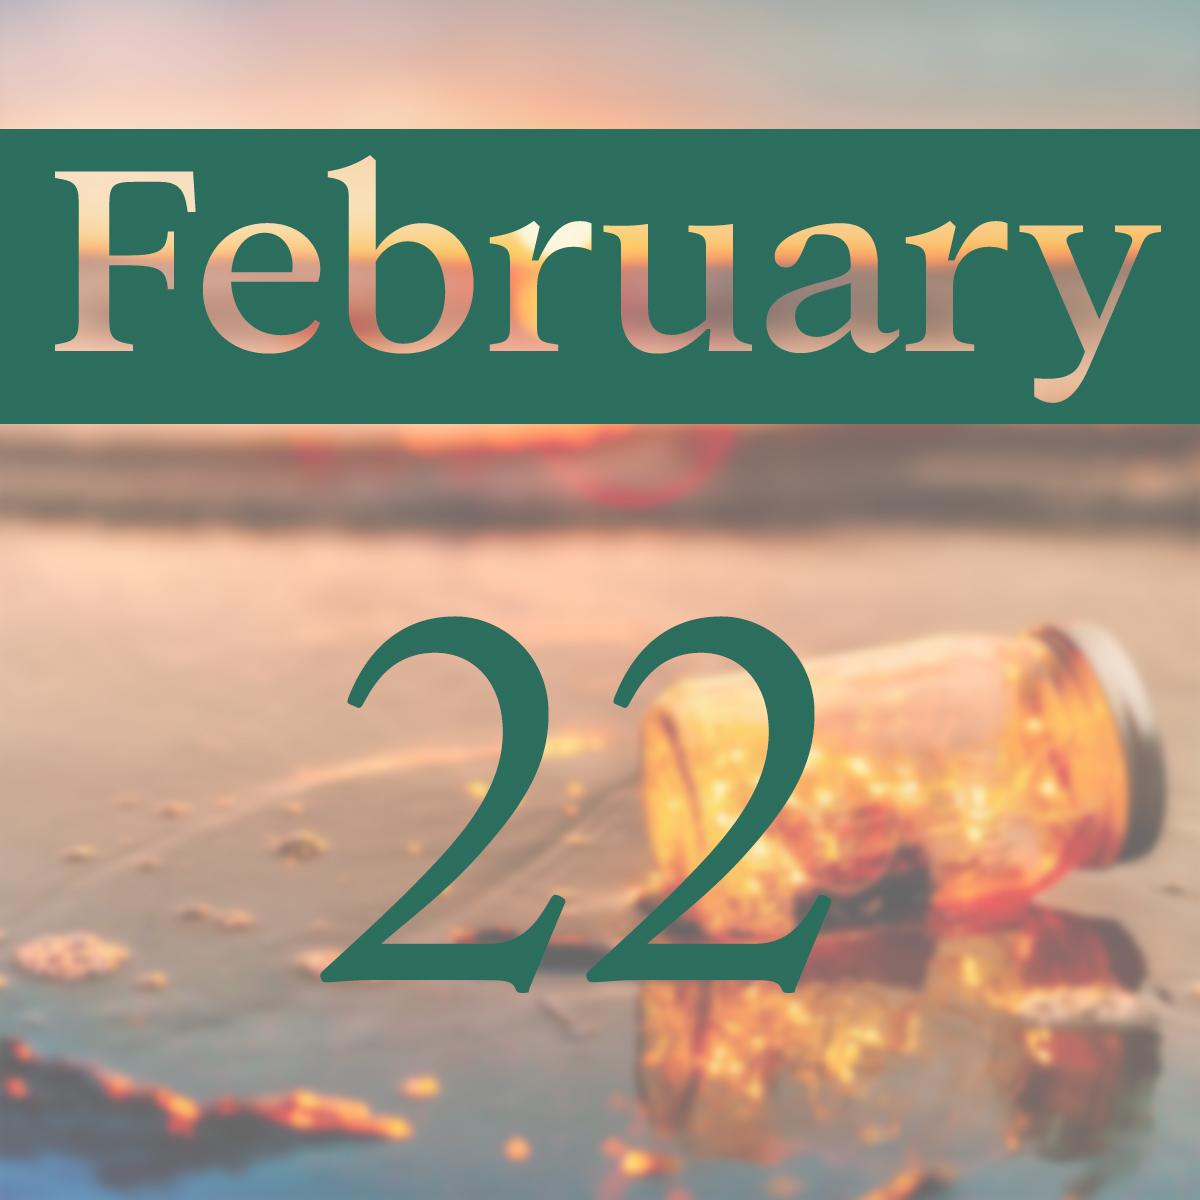 Saturday, February 22nd